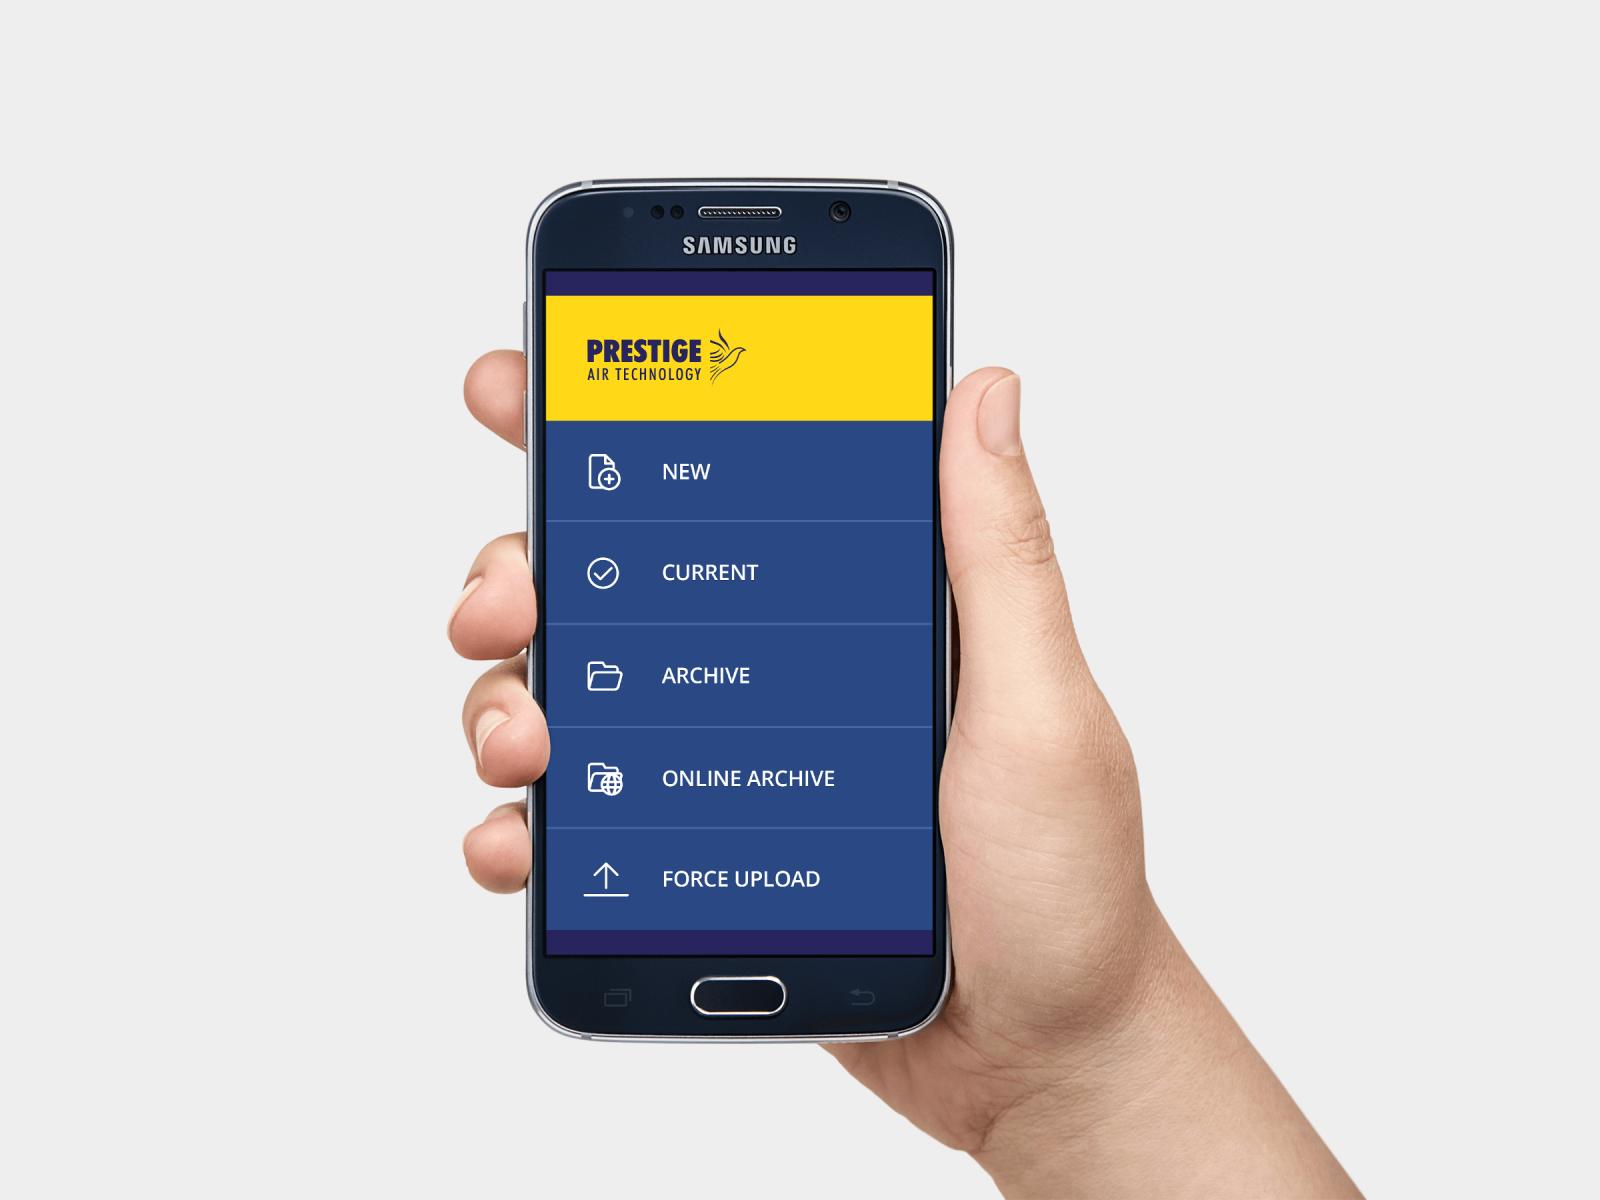 Prestige-app-ui-design-agency-graphic-design-canterbury-04.png